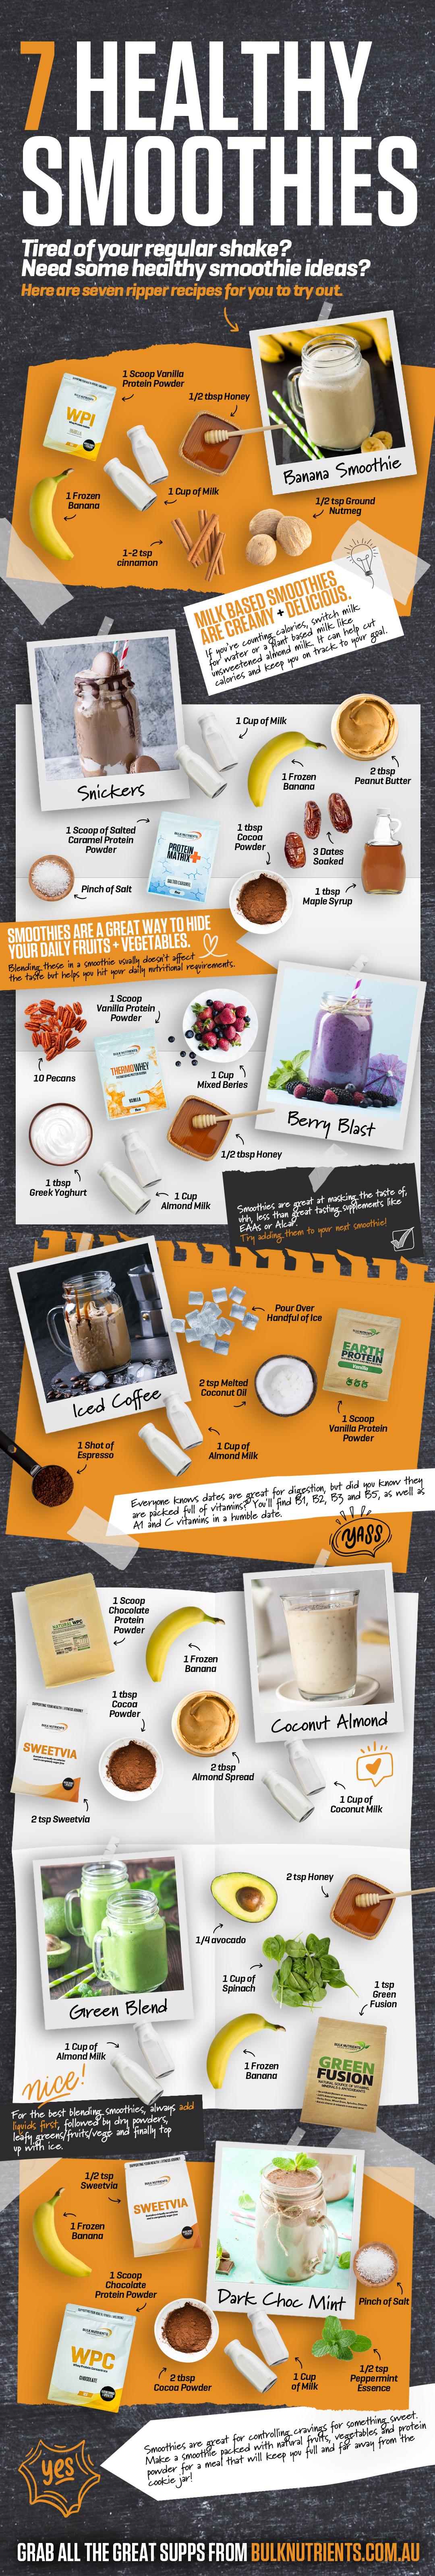 Bulk Nutrients' 7 Super Smoothies